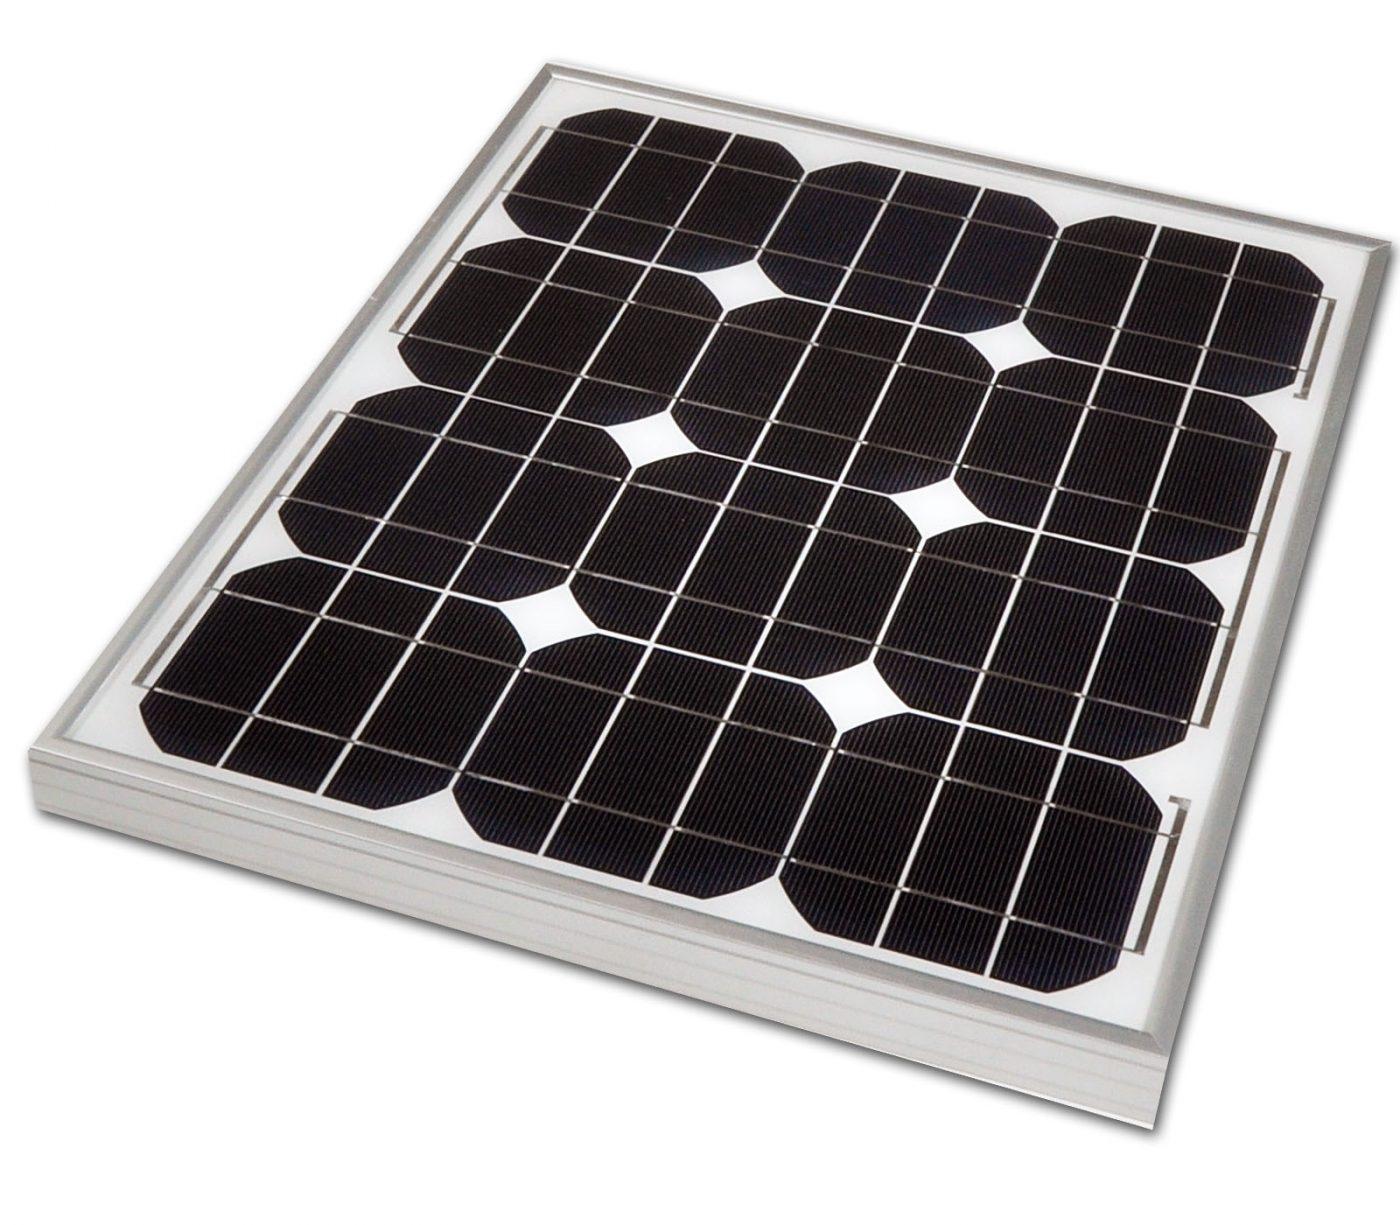 12v 30w Solar Panel Monocrystalline 536x477 Sunstore Solar